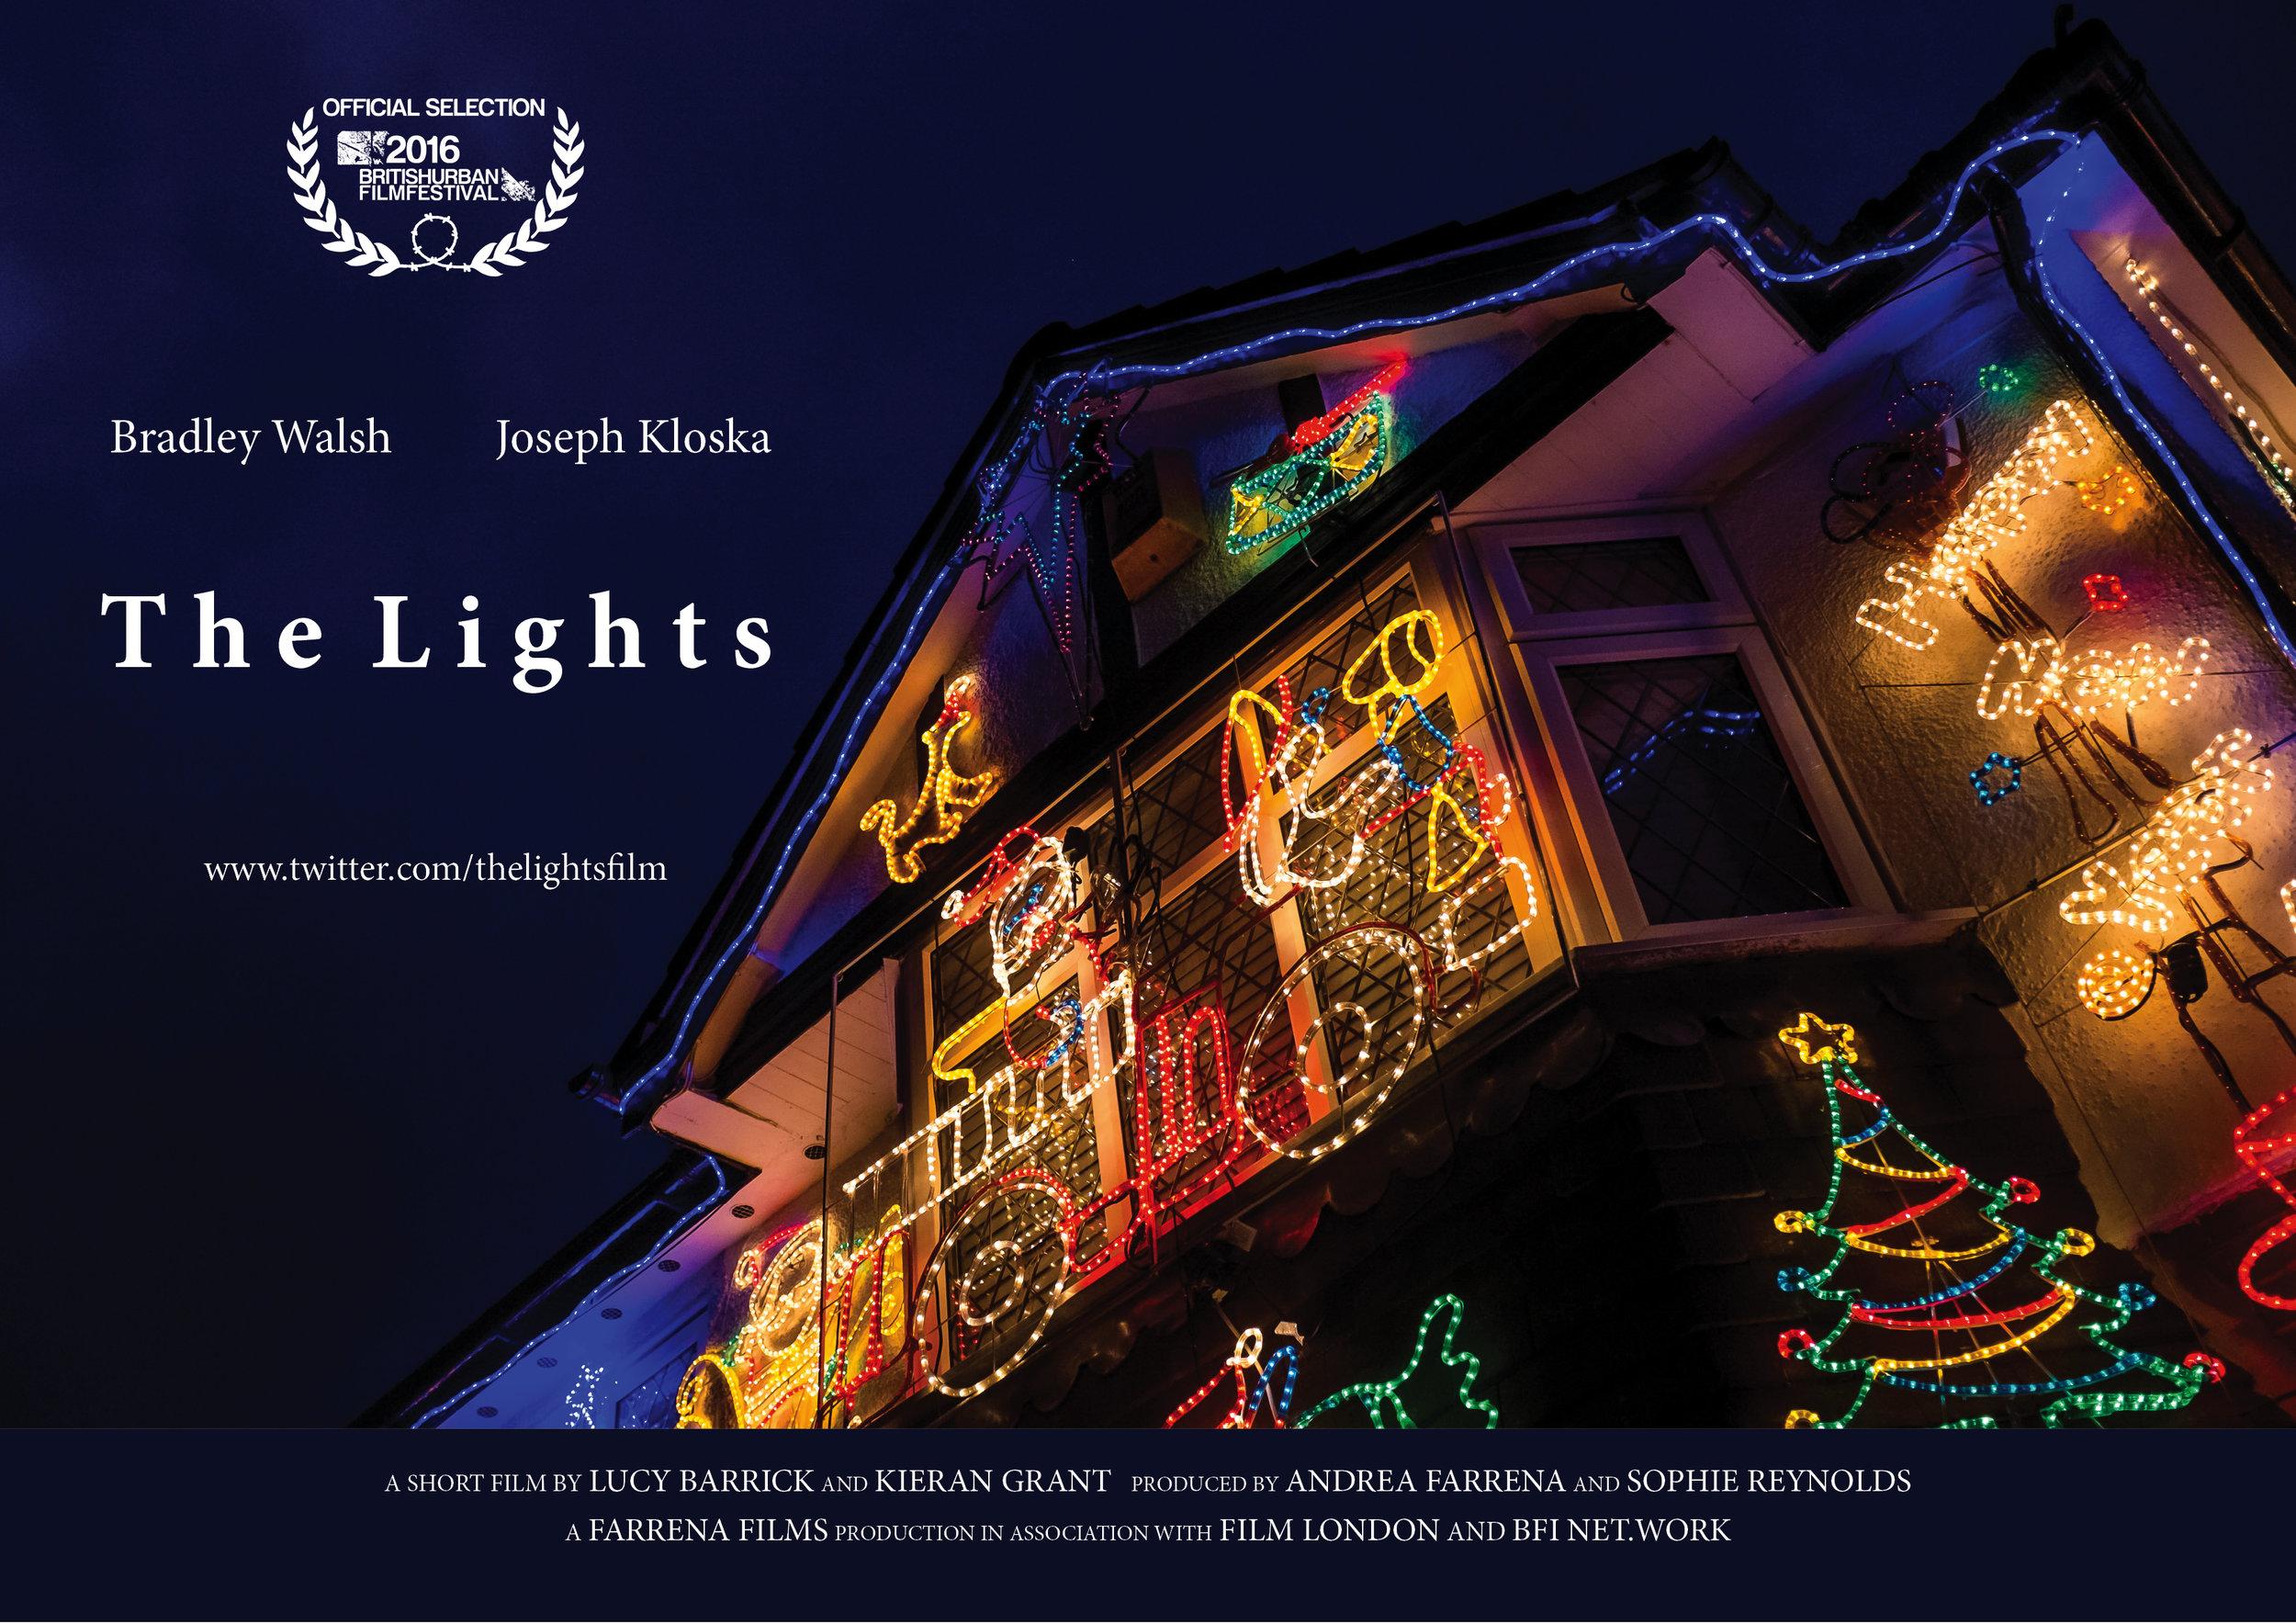 THE LIGHTS_BUFF_poster_landscape.jpg